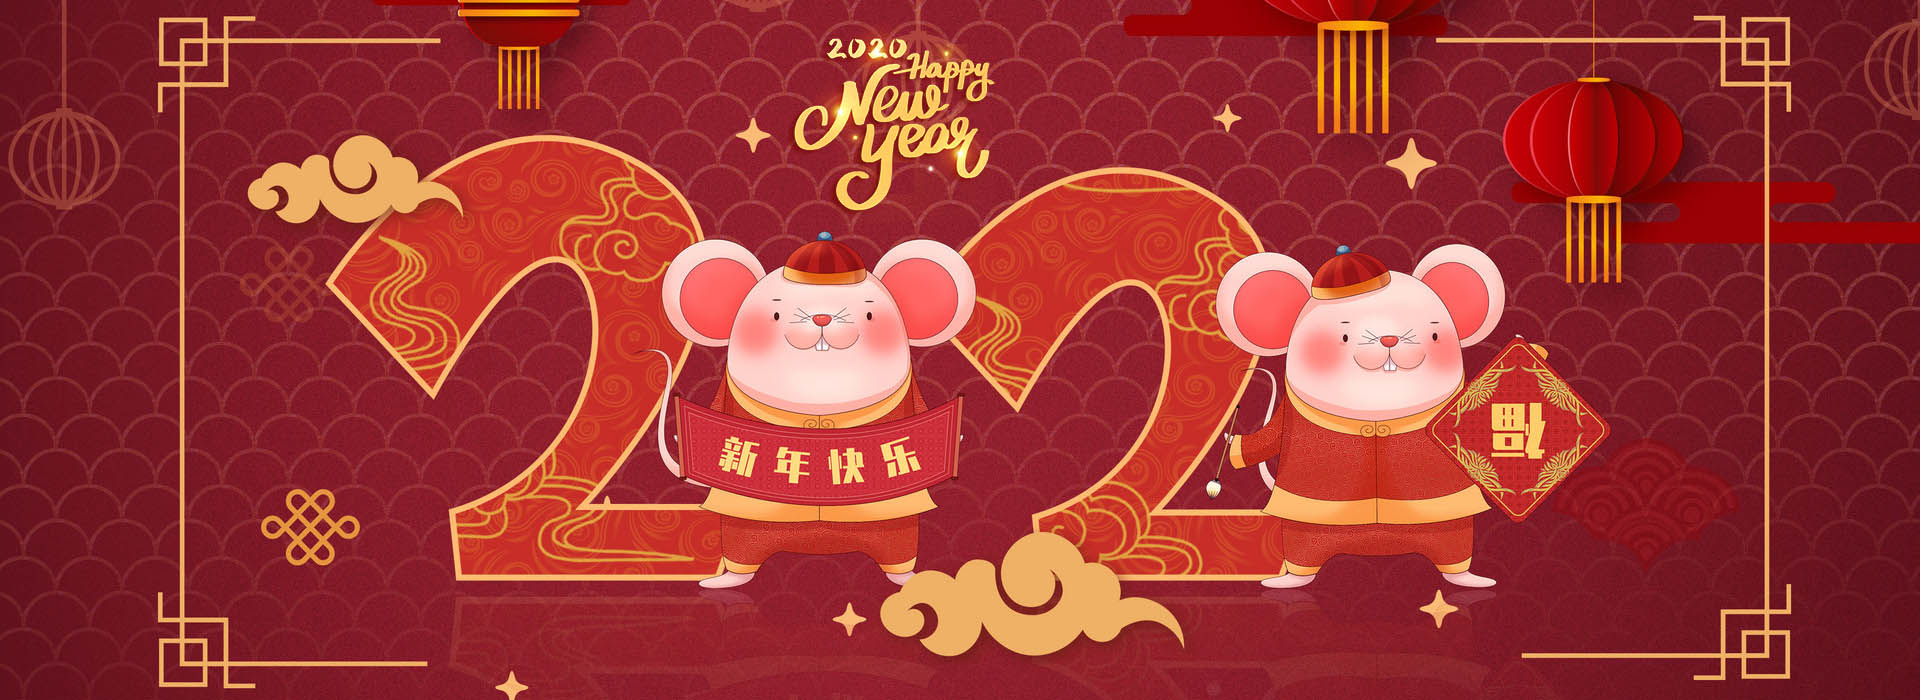 2020 Chinese New Year Holidays Notice